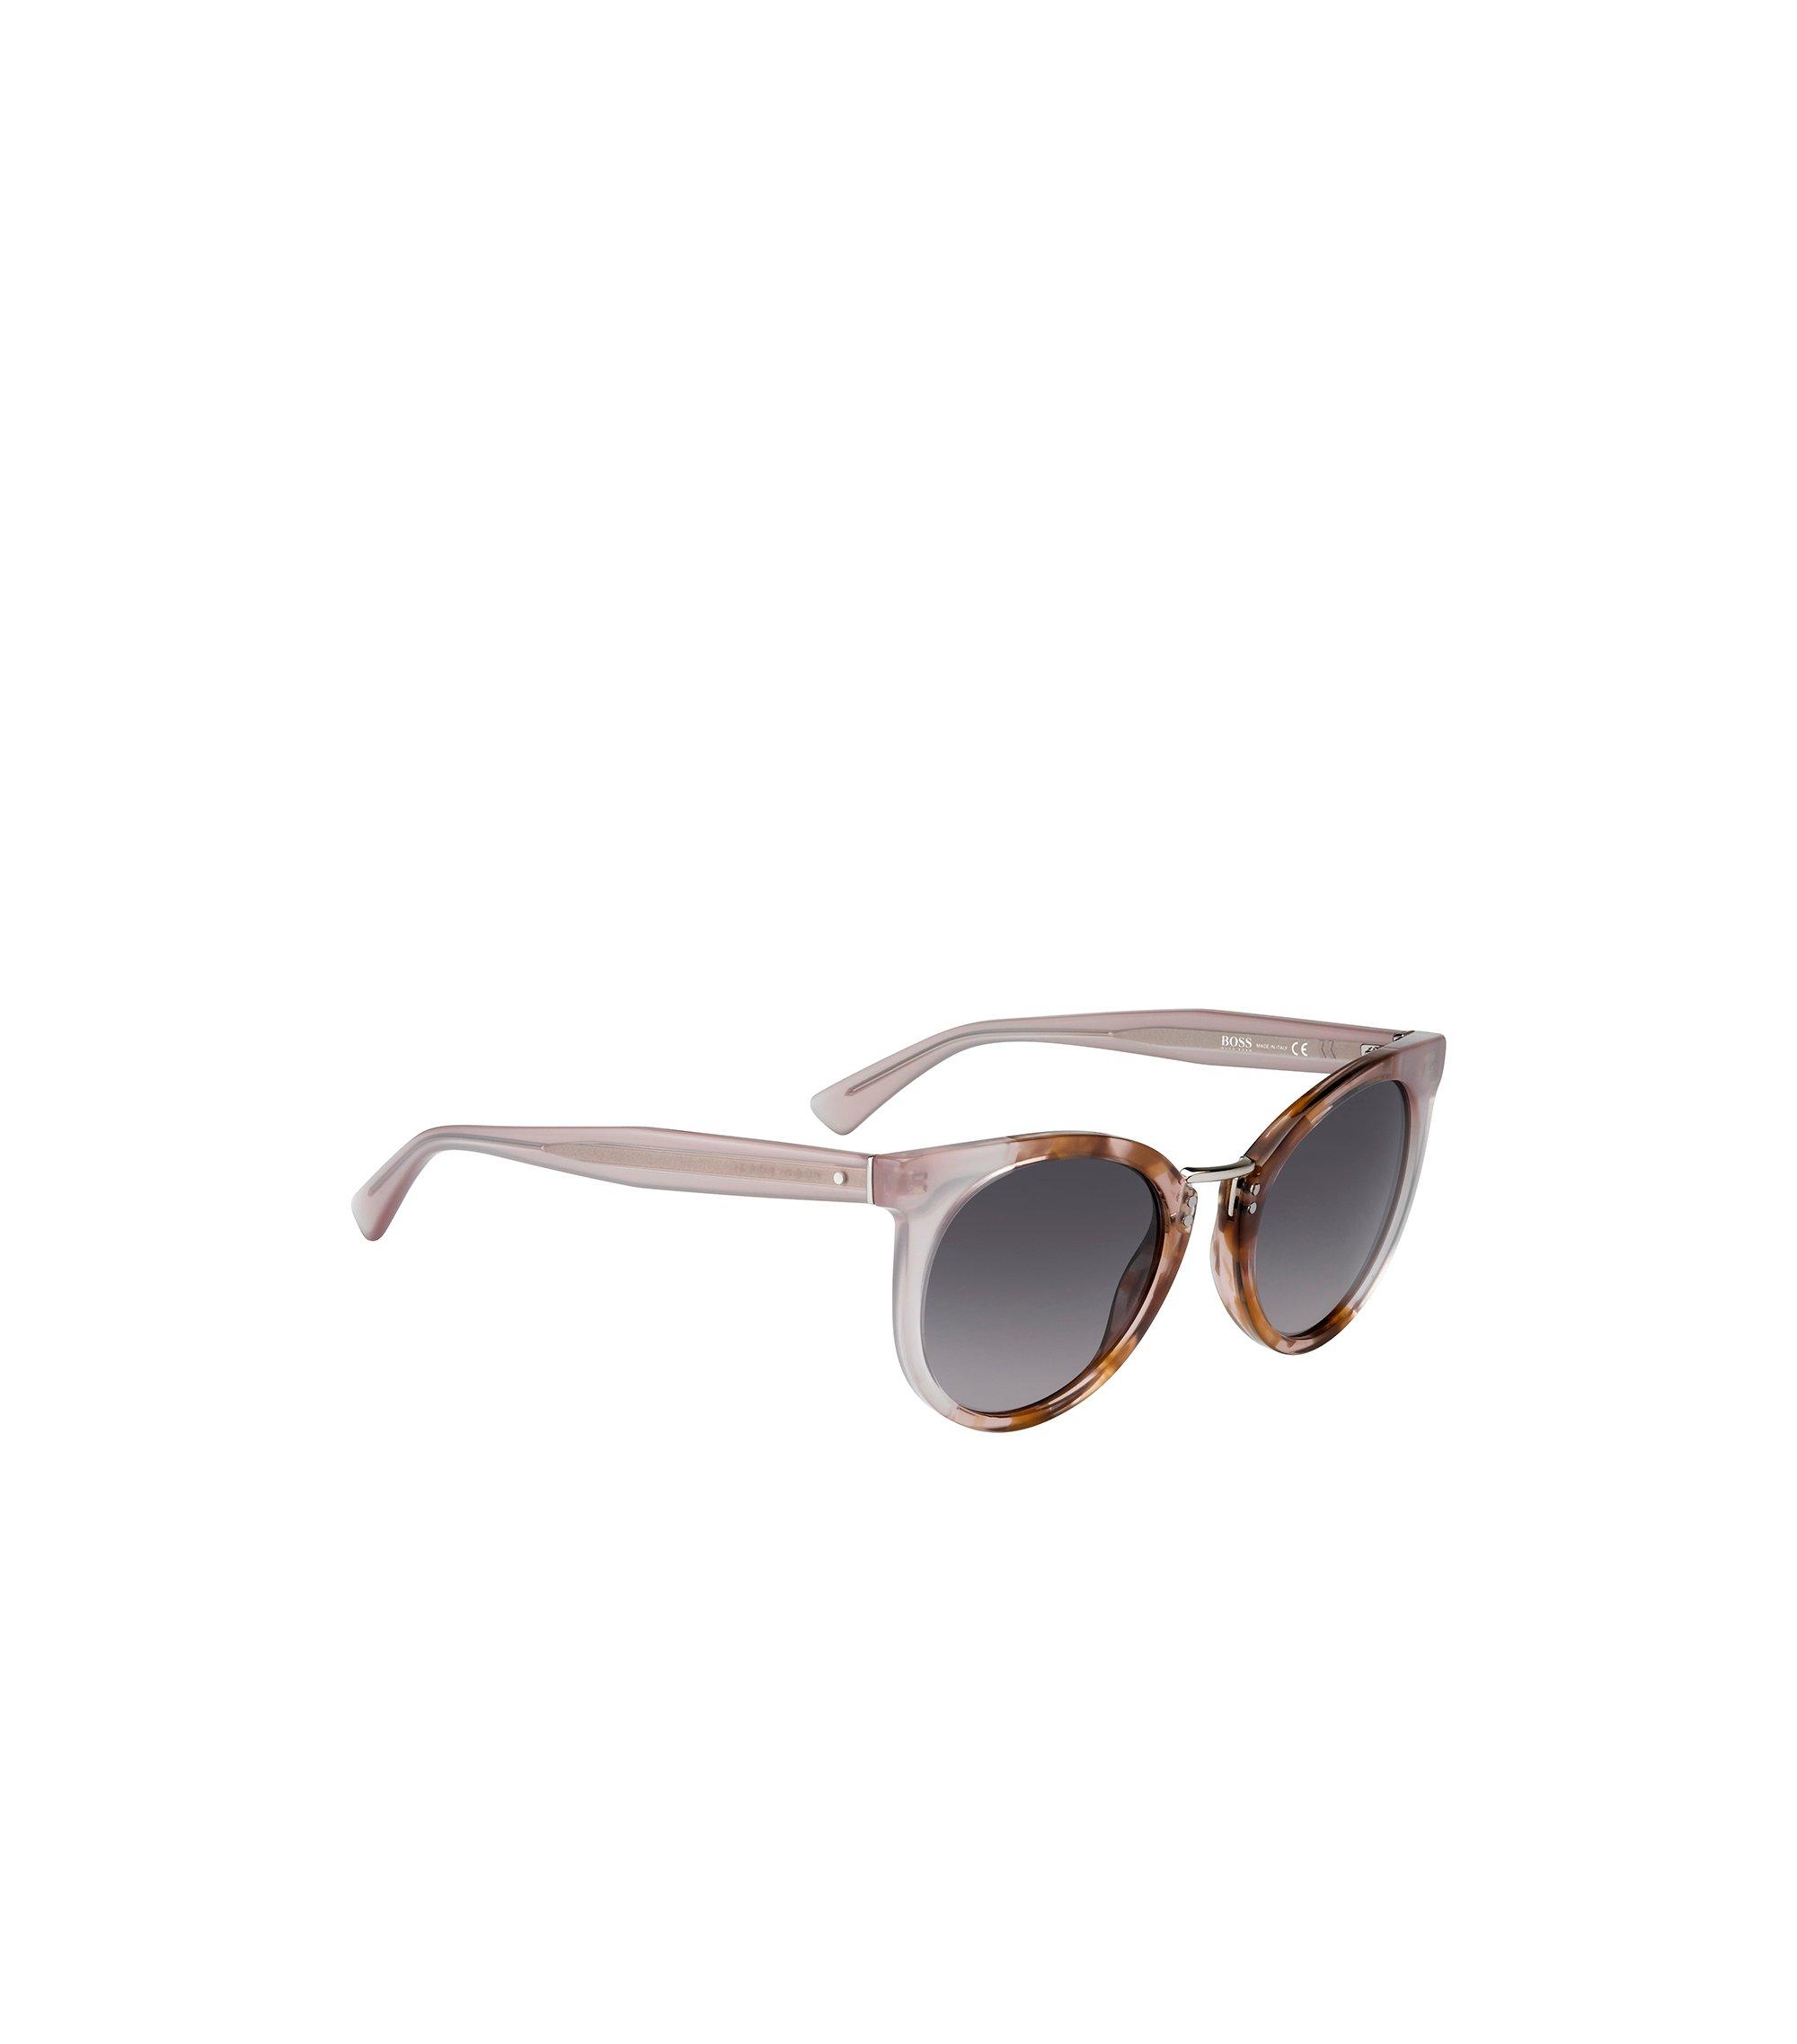 Gray Lens Rounded Cateye Havana Sunglasses | BOSS 0793S, Assorted-Pre-Pack